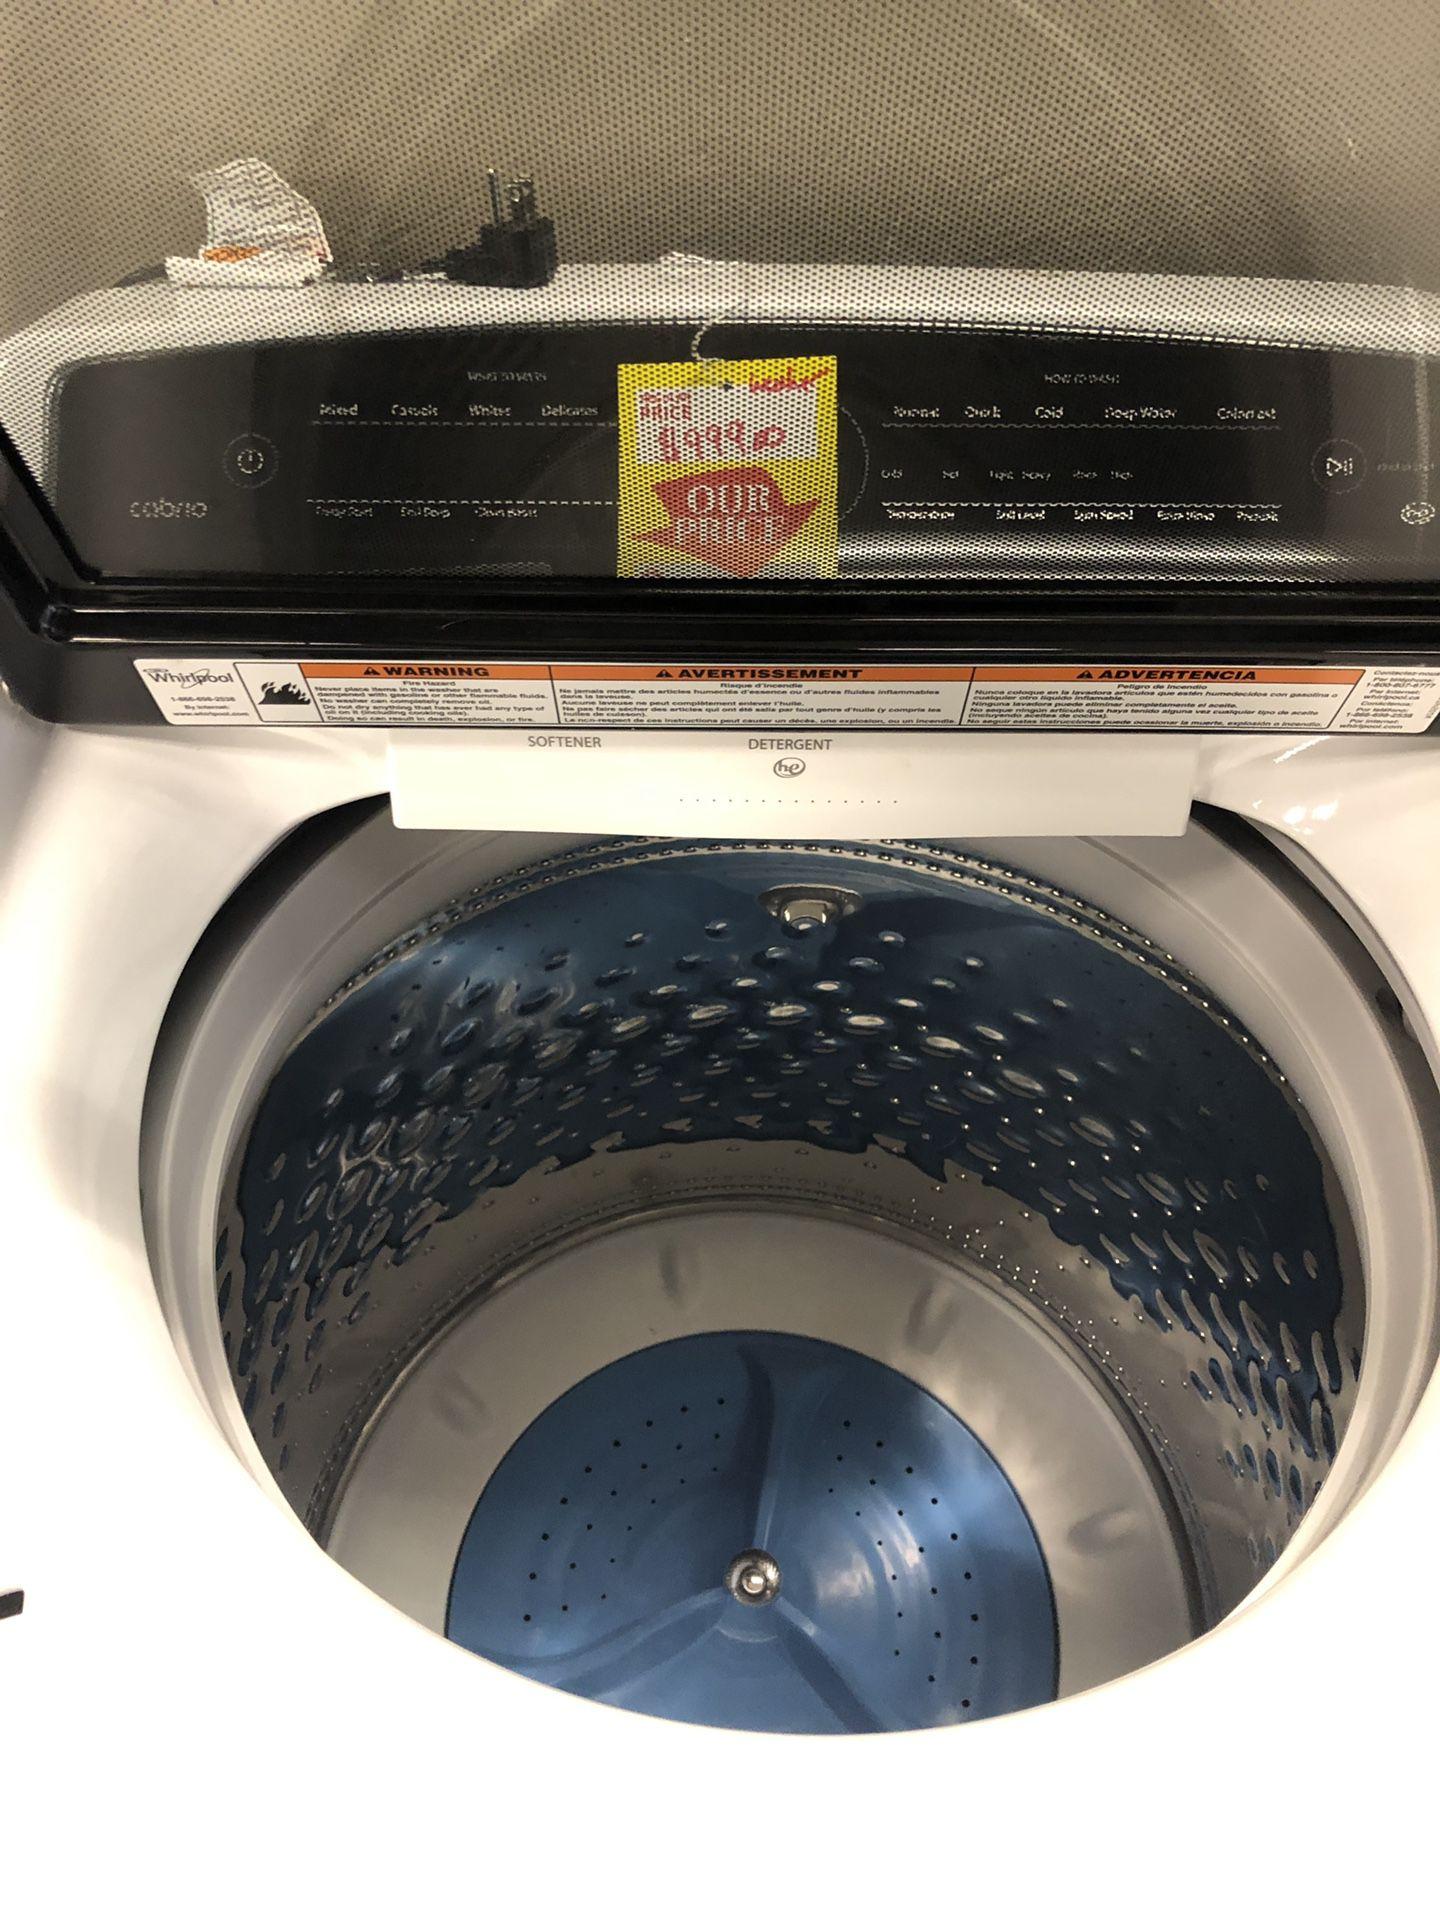 Whirlpool Washer 🙈⏰⚡️✔️🍂🔥😀🙈⏰⚡️✔️🍂🔥😀🙈⏰⚡️✔️ Appliance Liquidation!!!!!!!!!!!